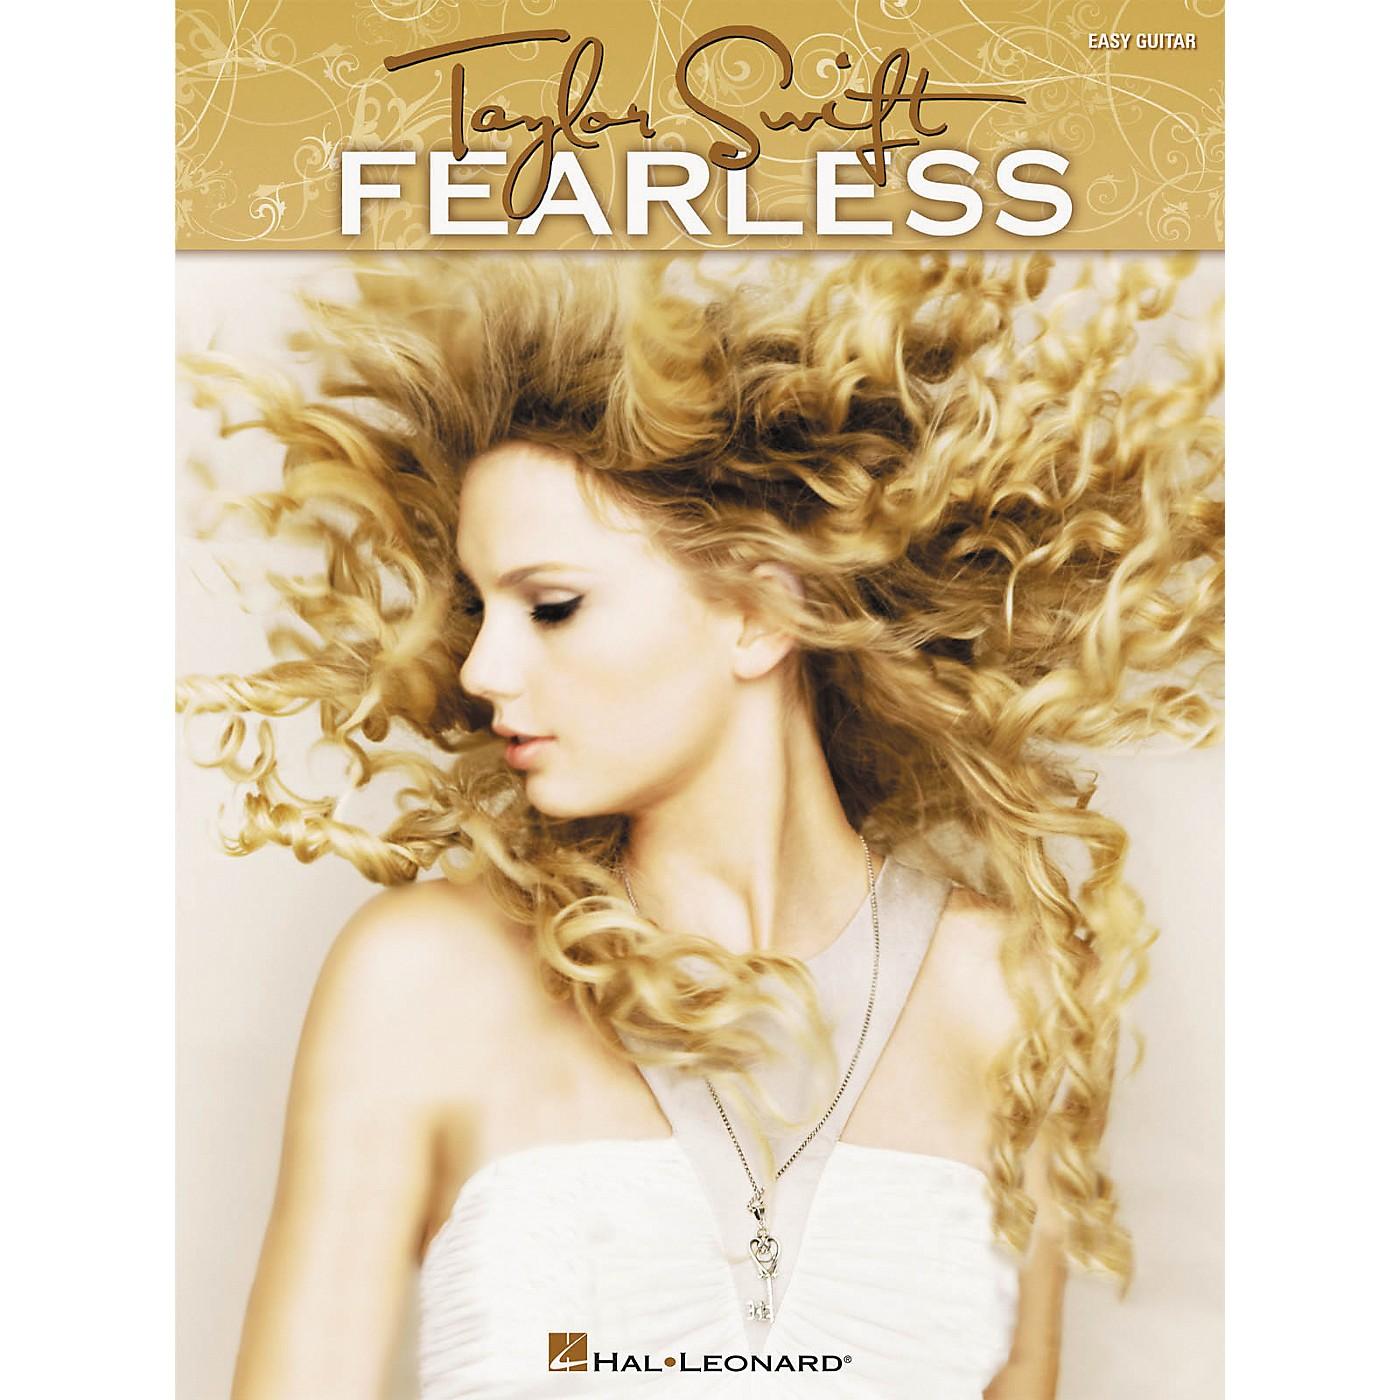 Hal Leonard Taylor Swift - Fearless - Easy Guitar (Book) thumbnail